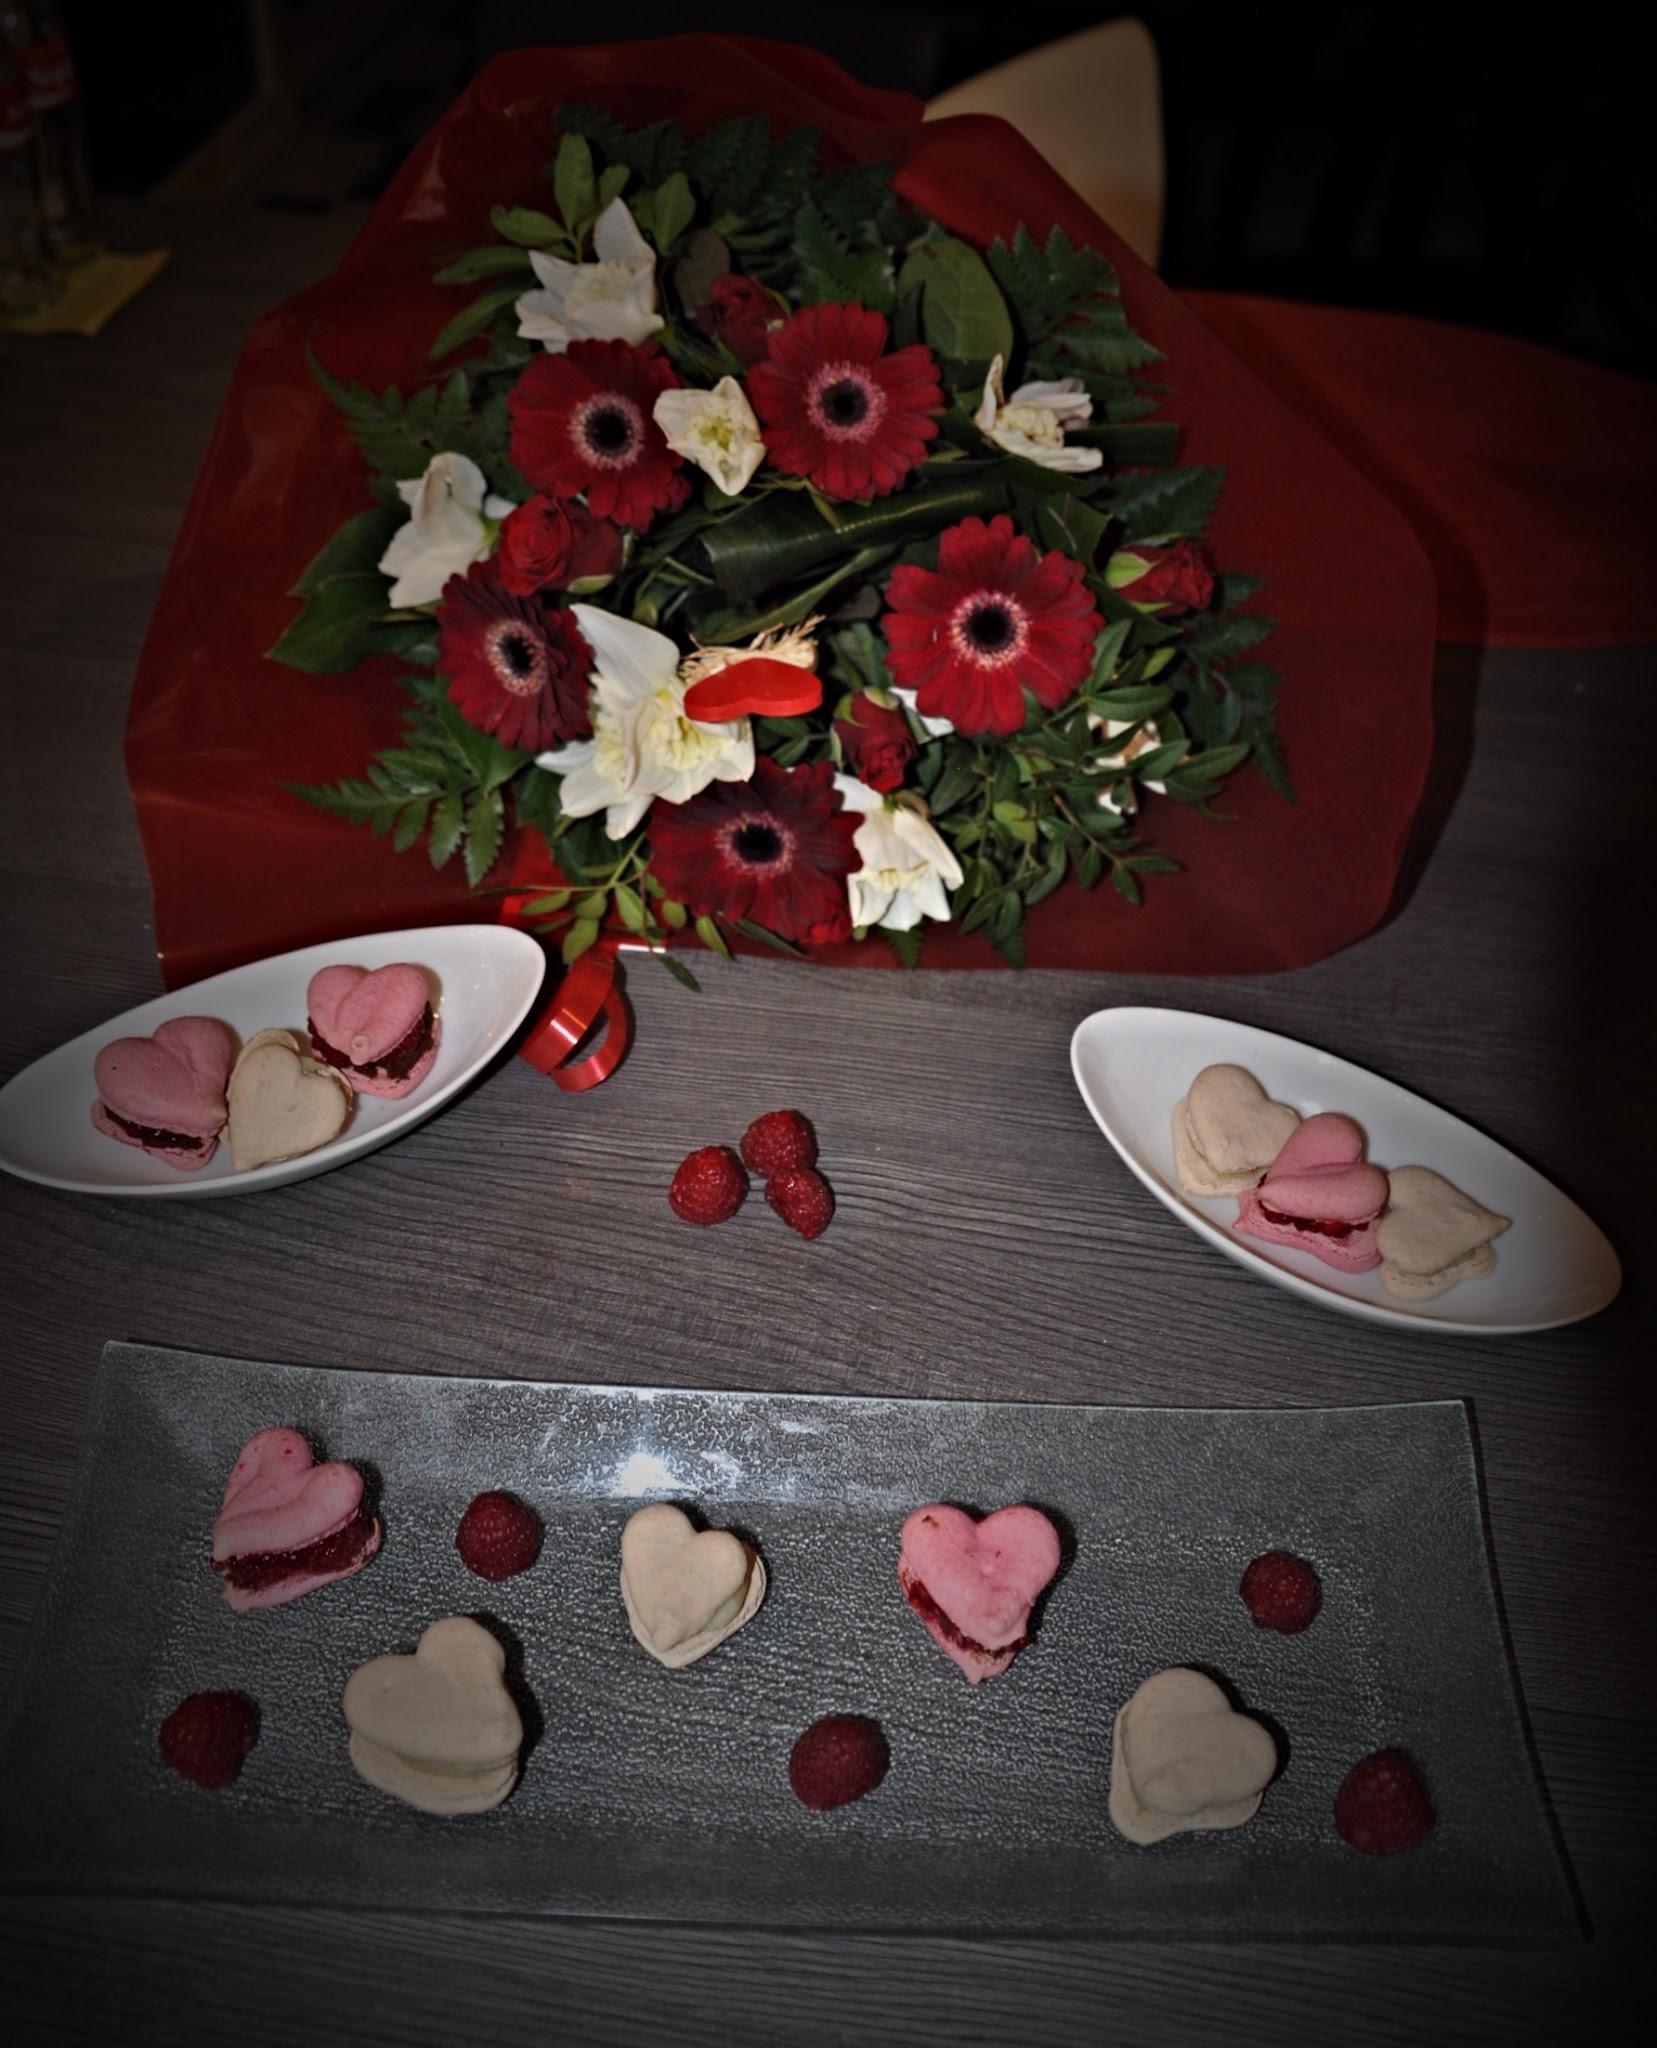 idee-cadeau-saint-valentin-fait-maison